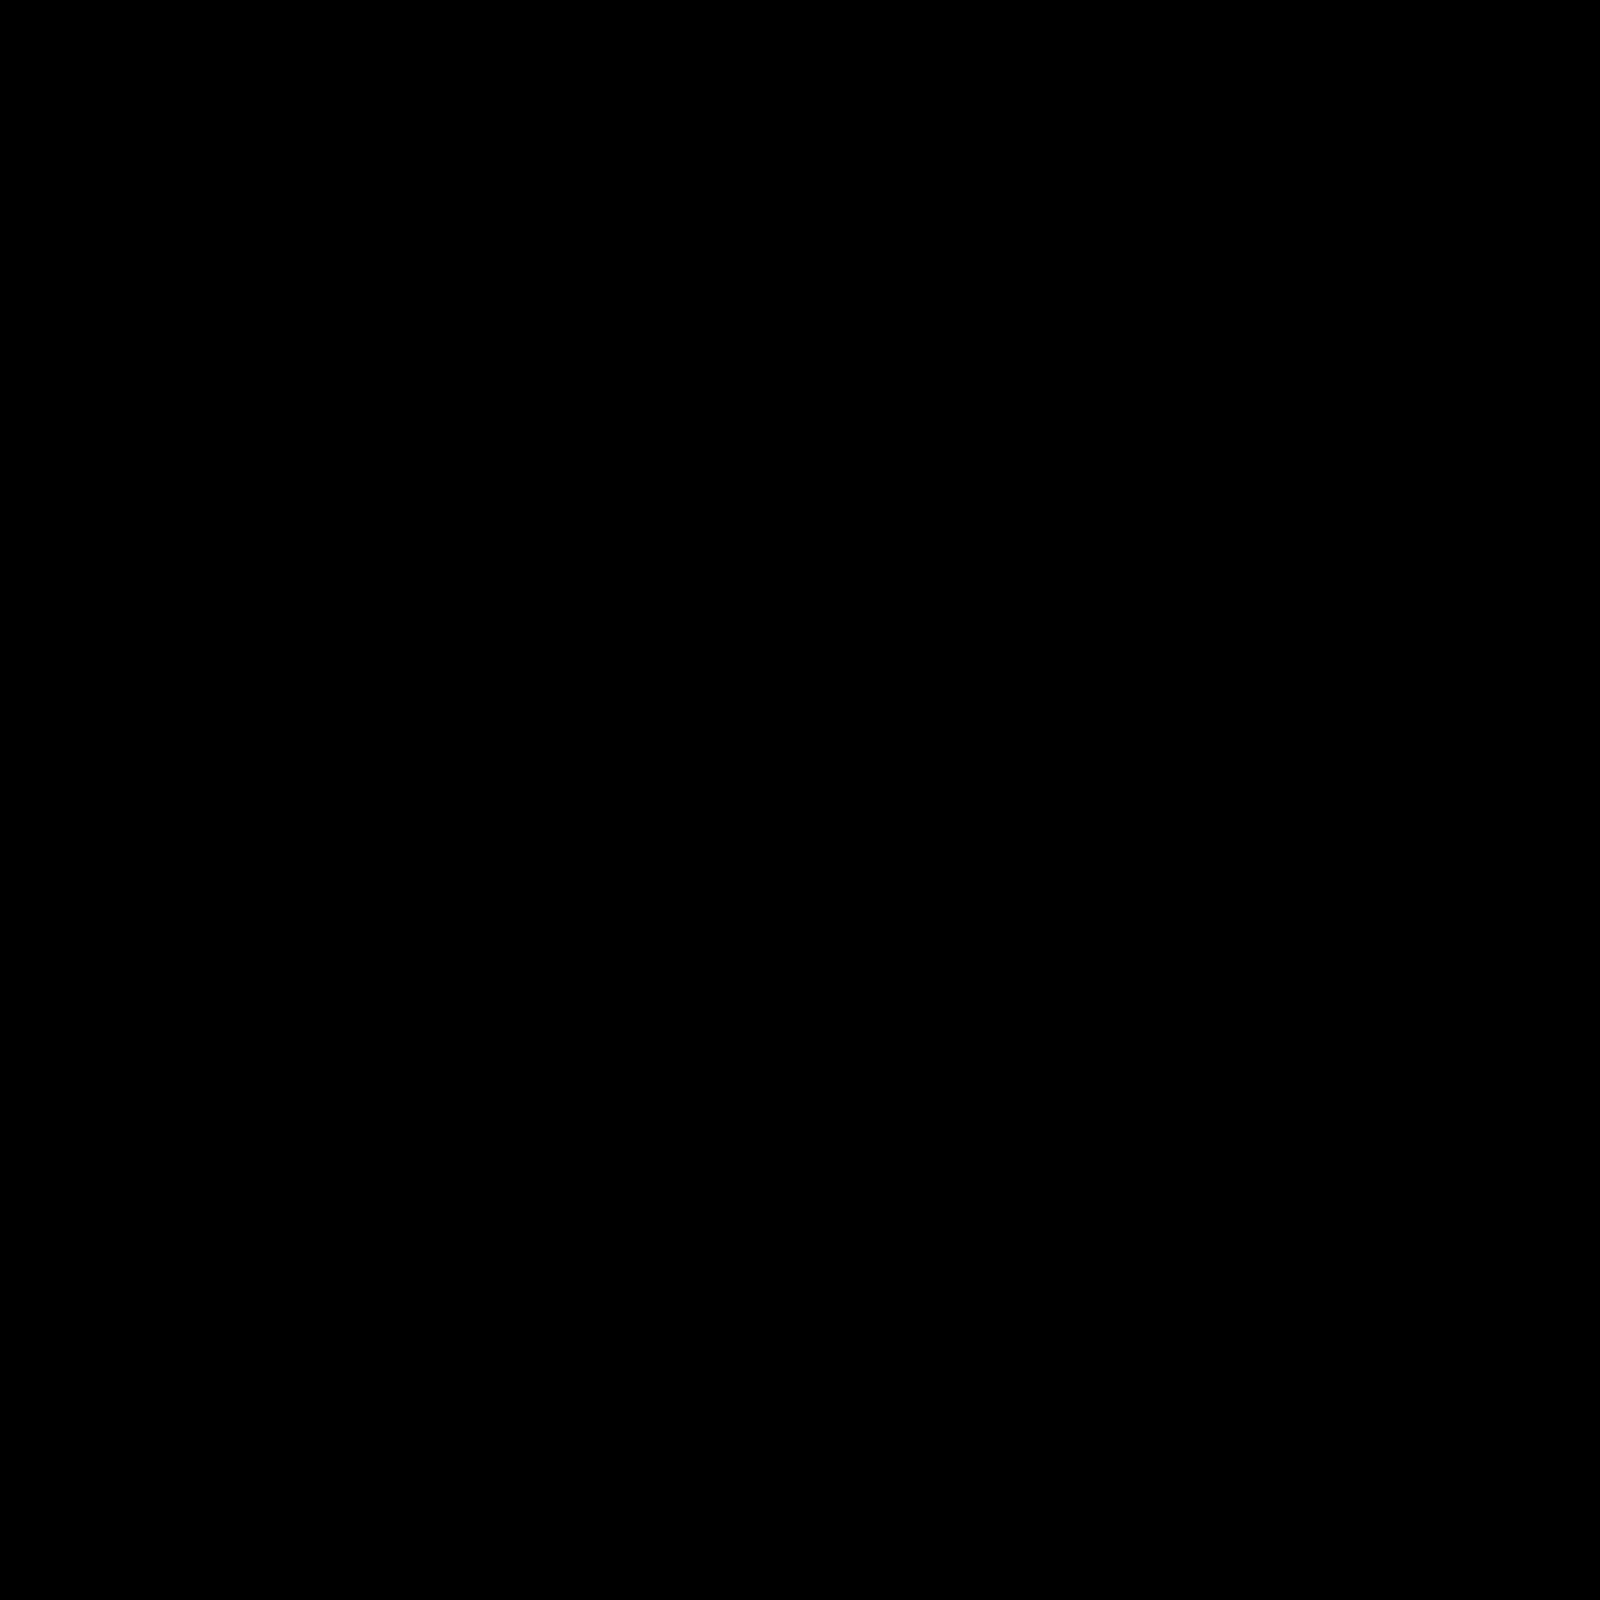 Paper icon free download. Emoji clipart plane